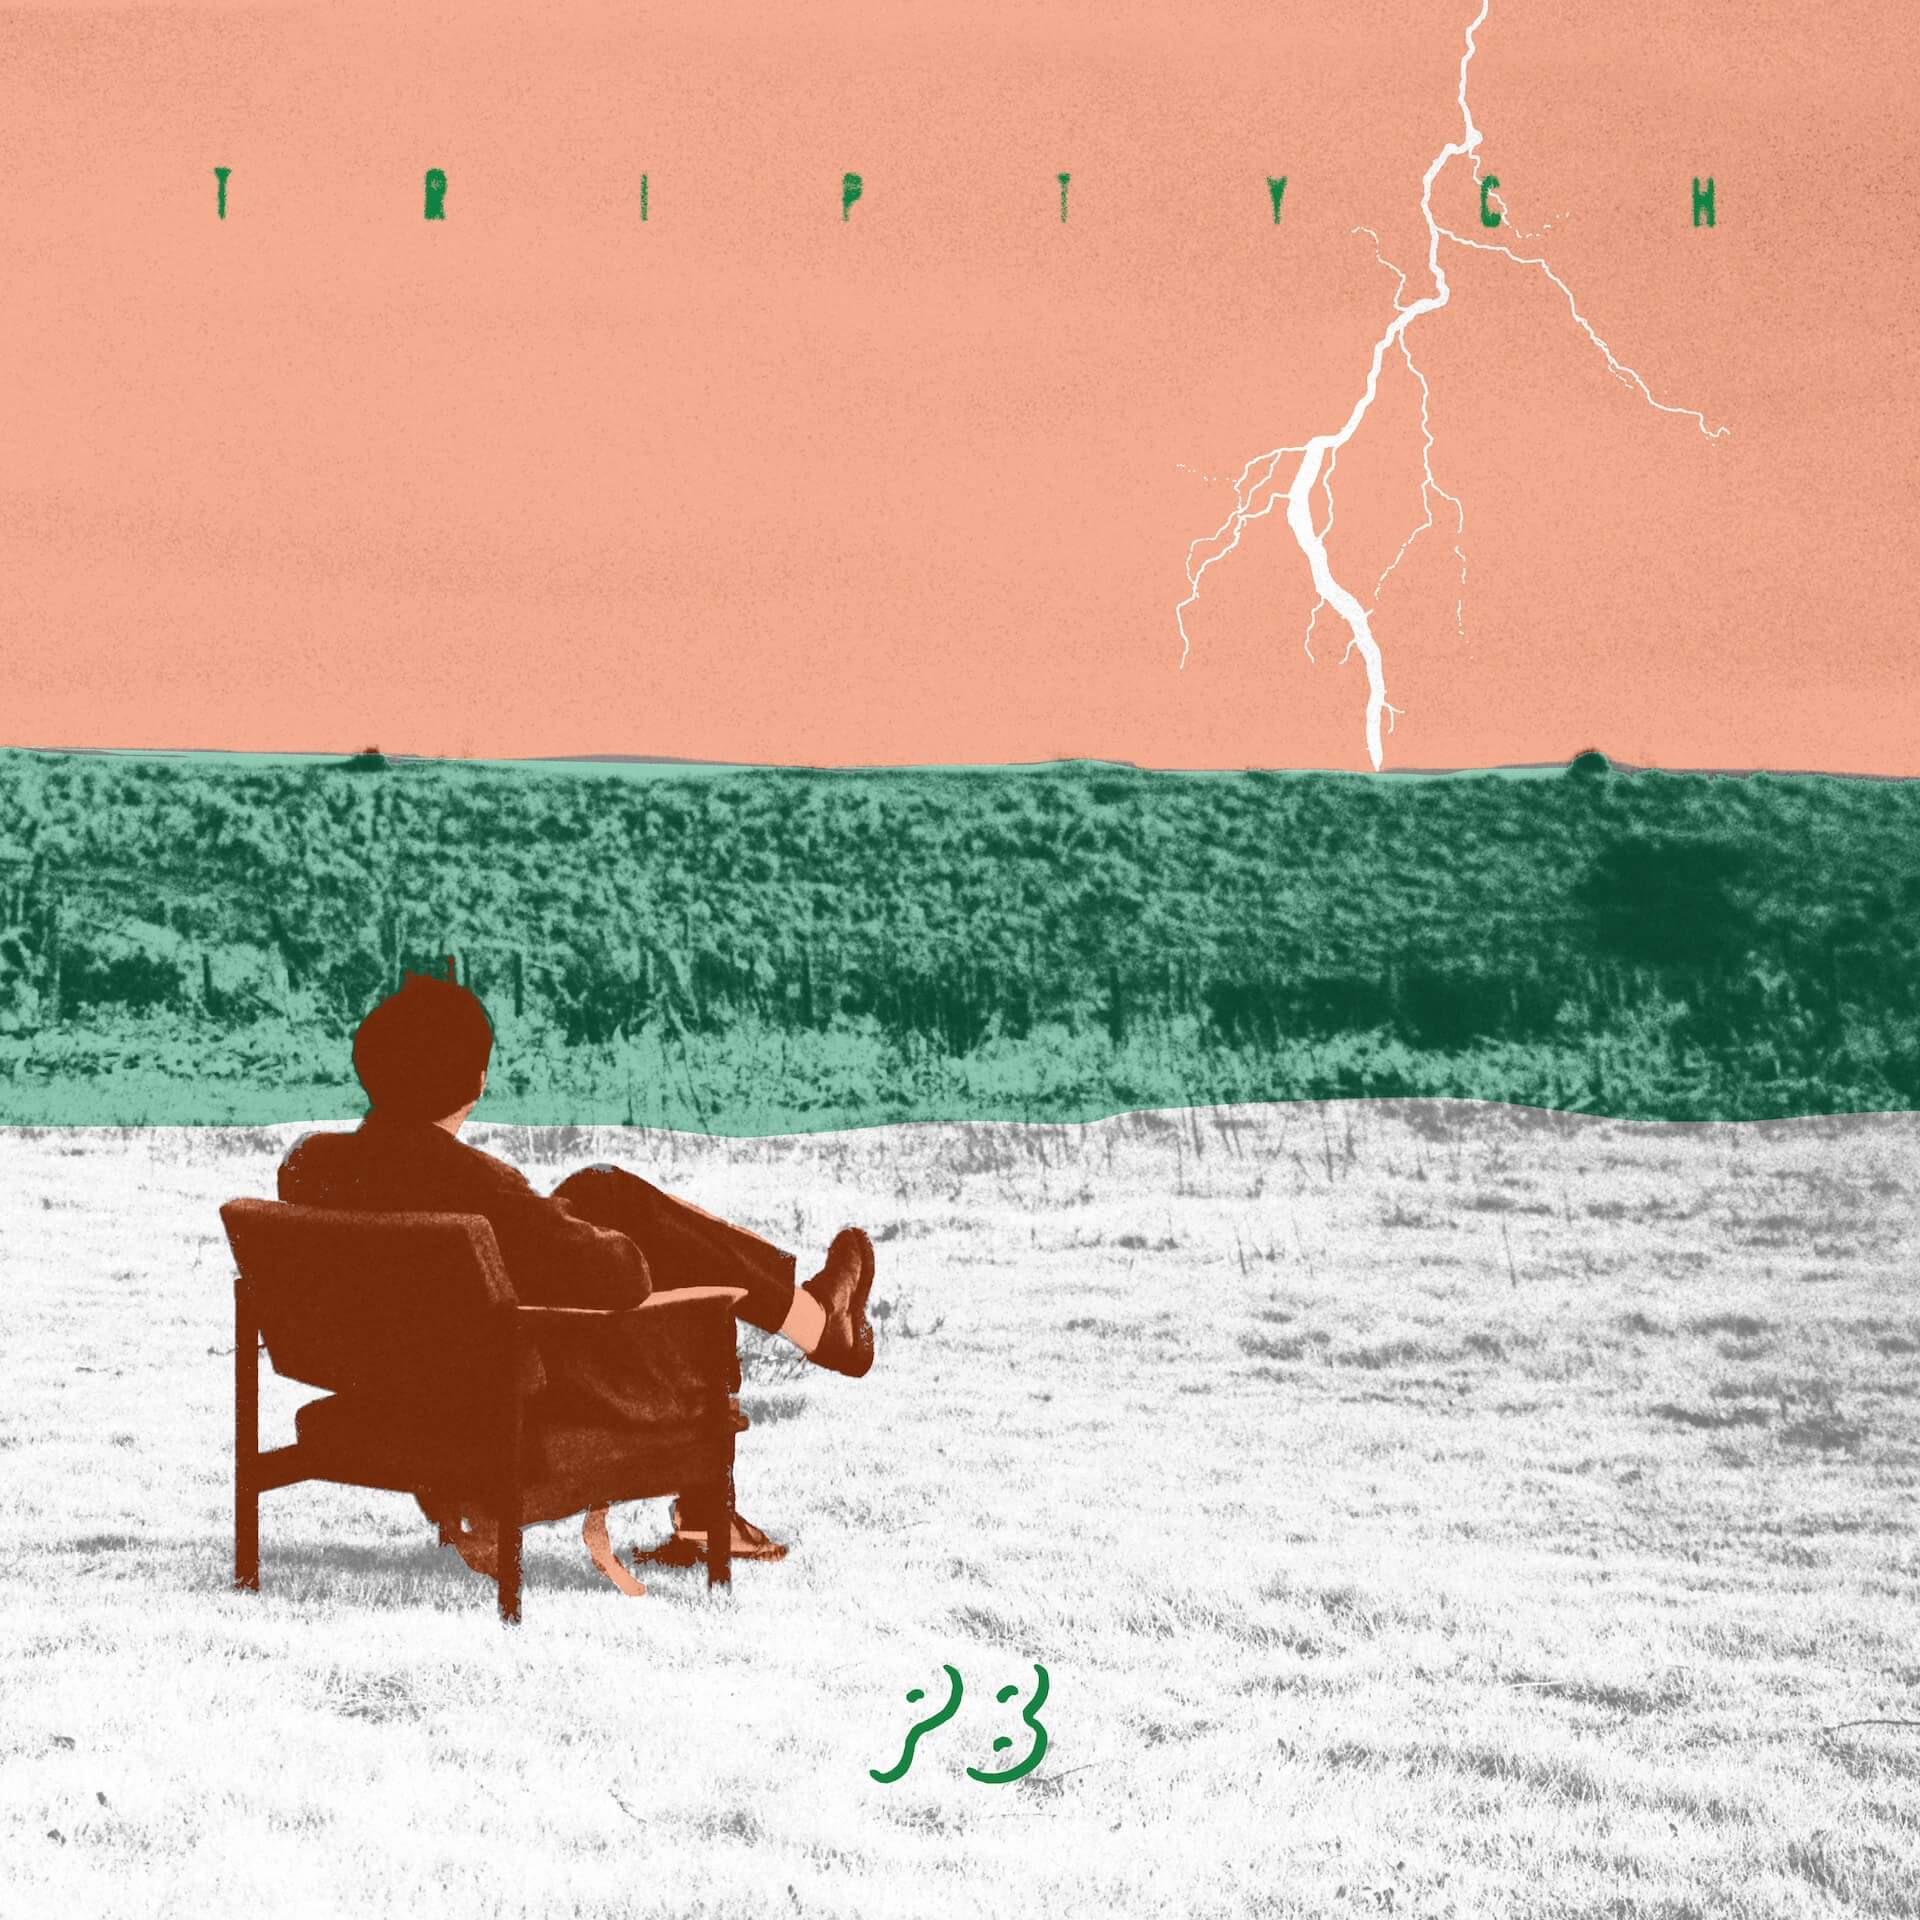 cero高城昌平「Shohei Takagi Parallela Botanica」の1stアルバム『Triptych』ジャケ写や収録曲が公開!初回盤にはライブやインタビューの映像特典も music20310_takagishouhei_triptych_04